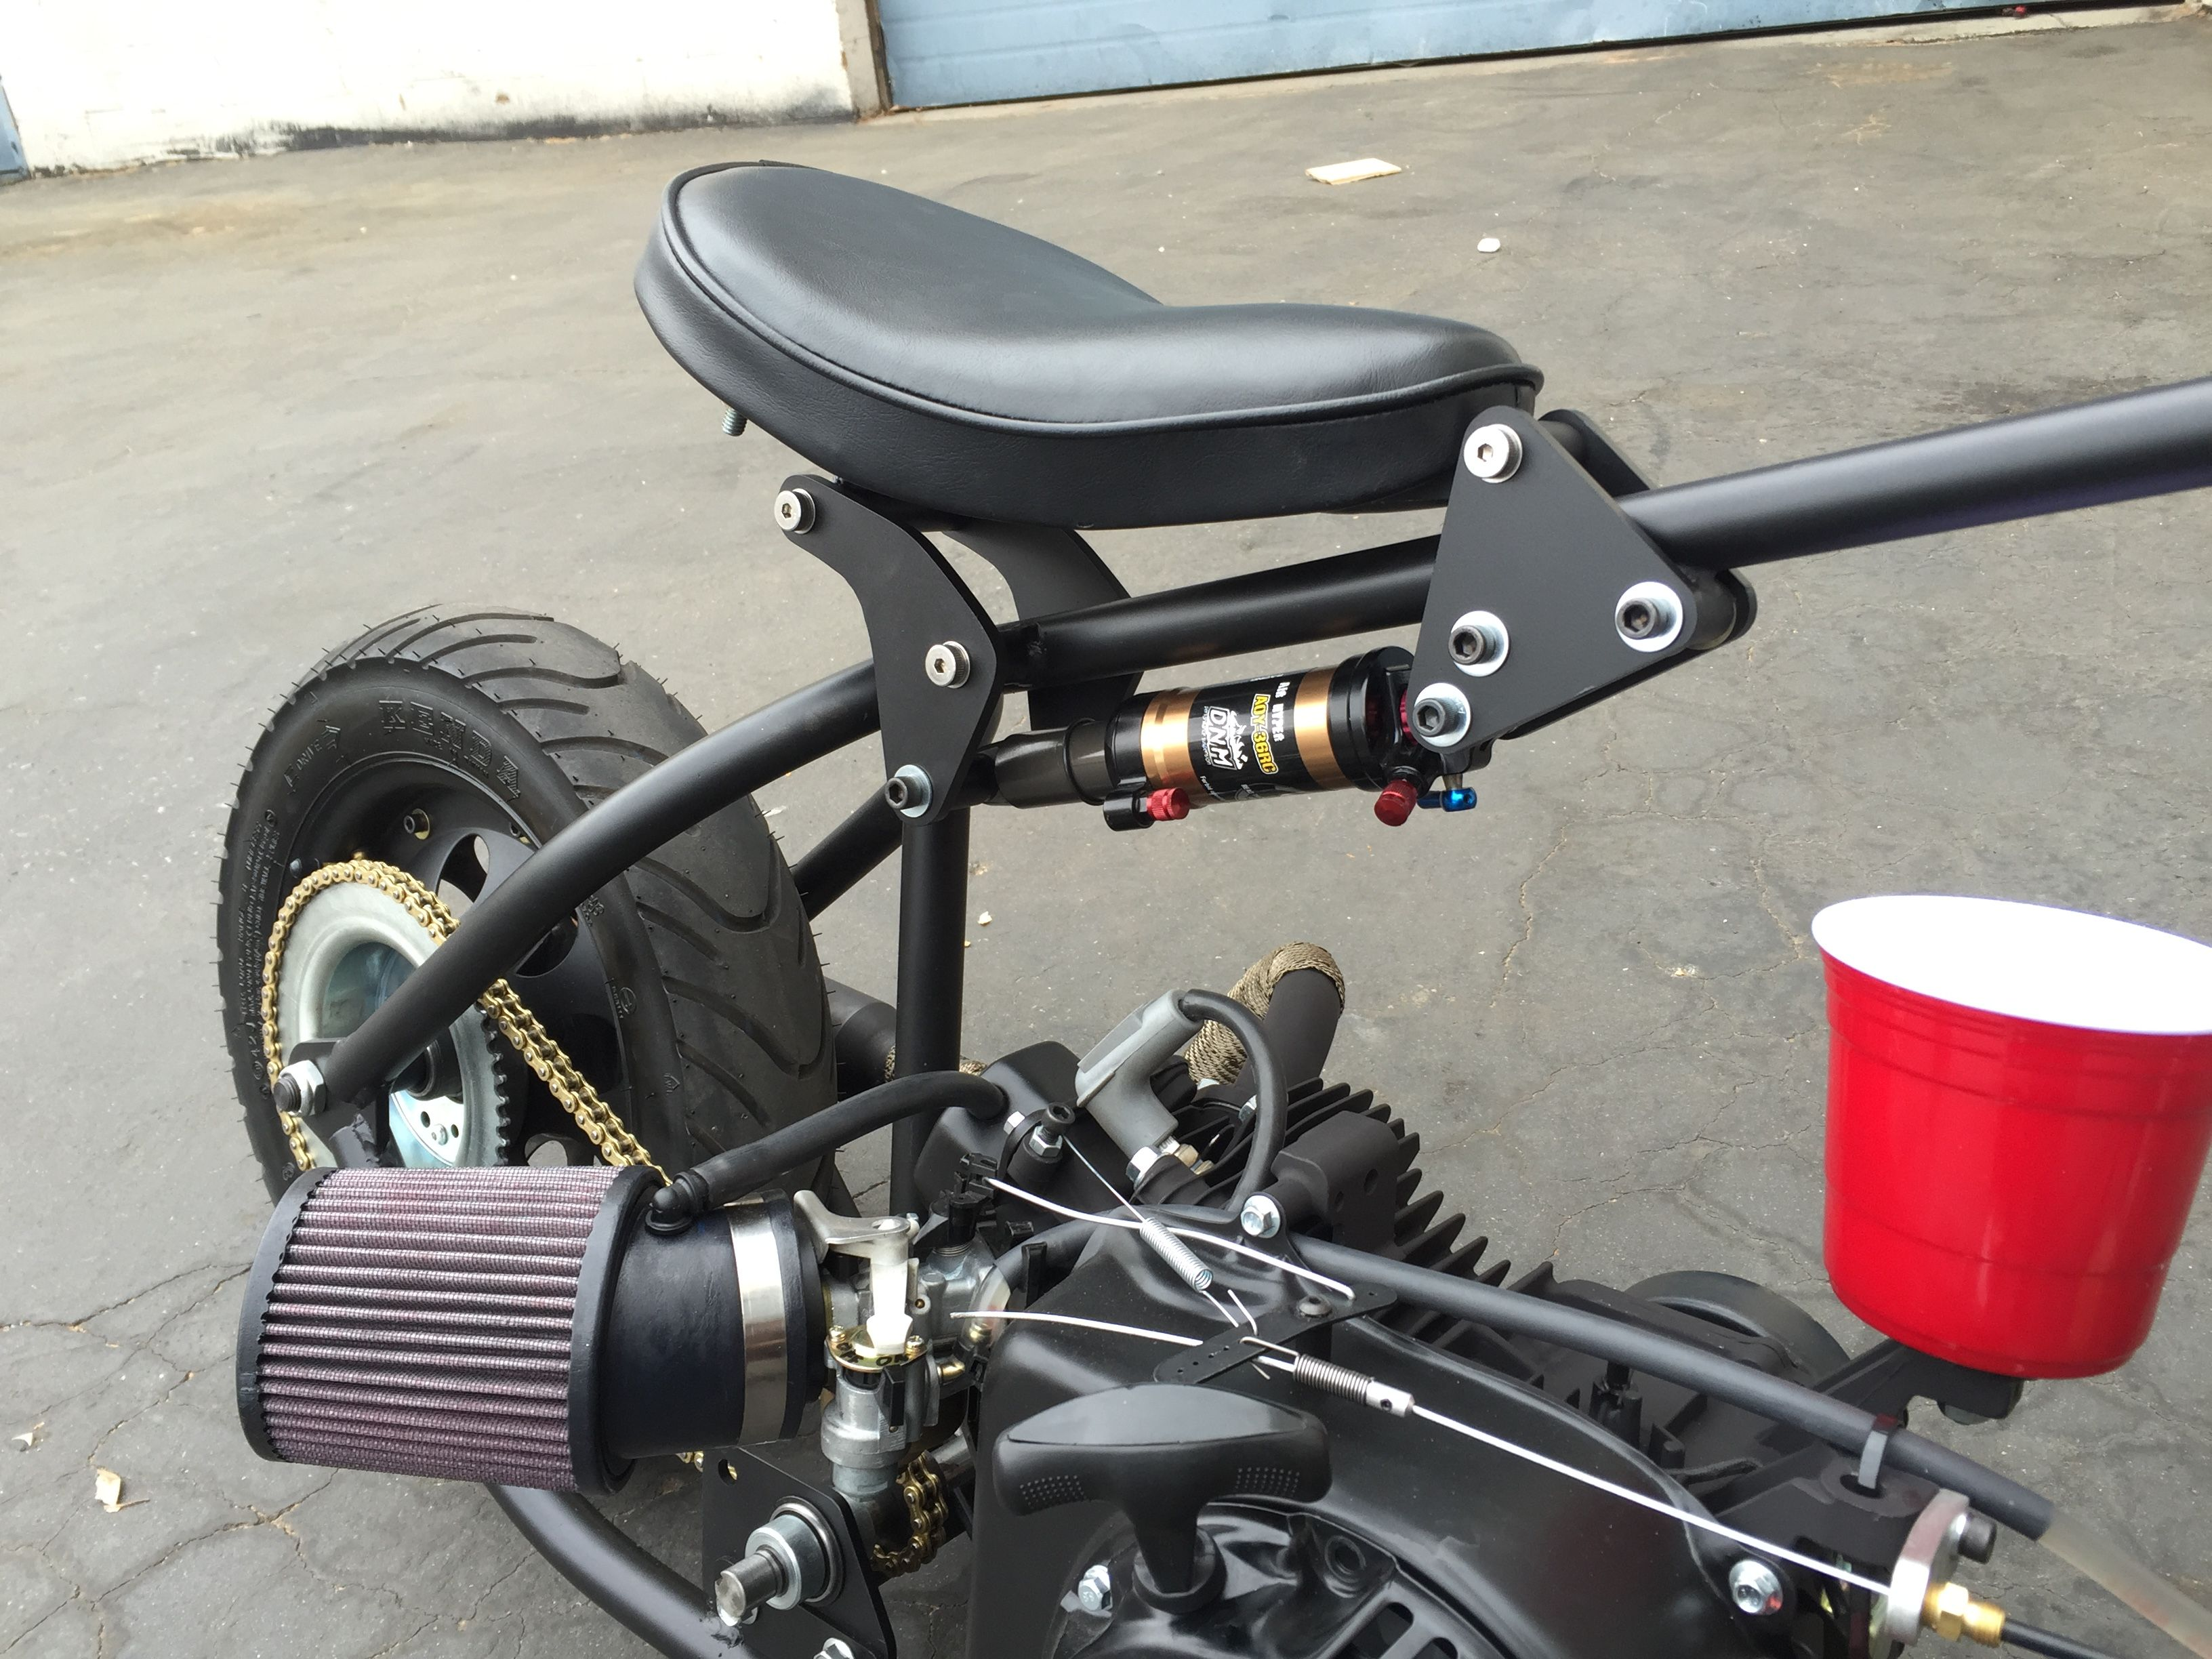 50cc Pocket Bike Top Speed